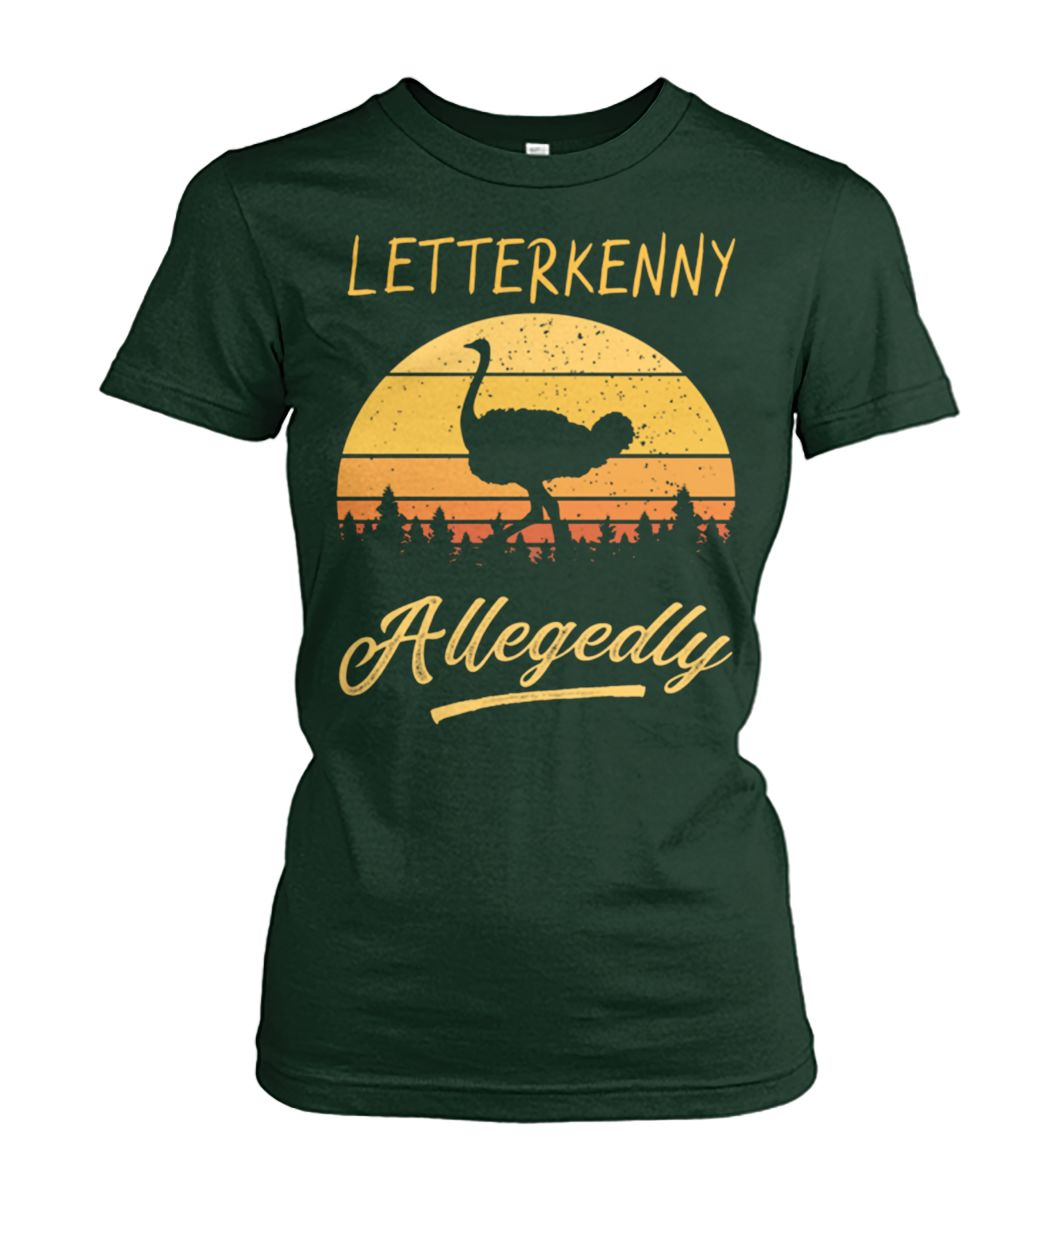 [Hot version] Letterkenny allegedly ostrich vintage shirt